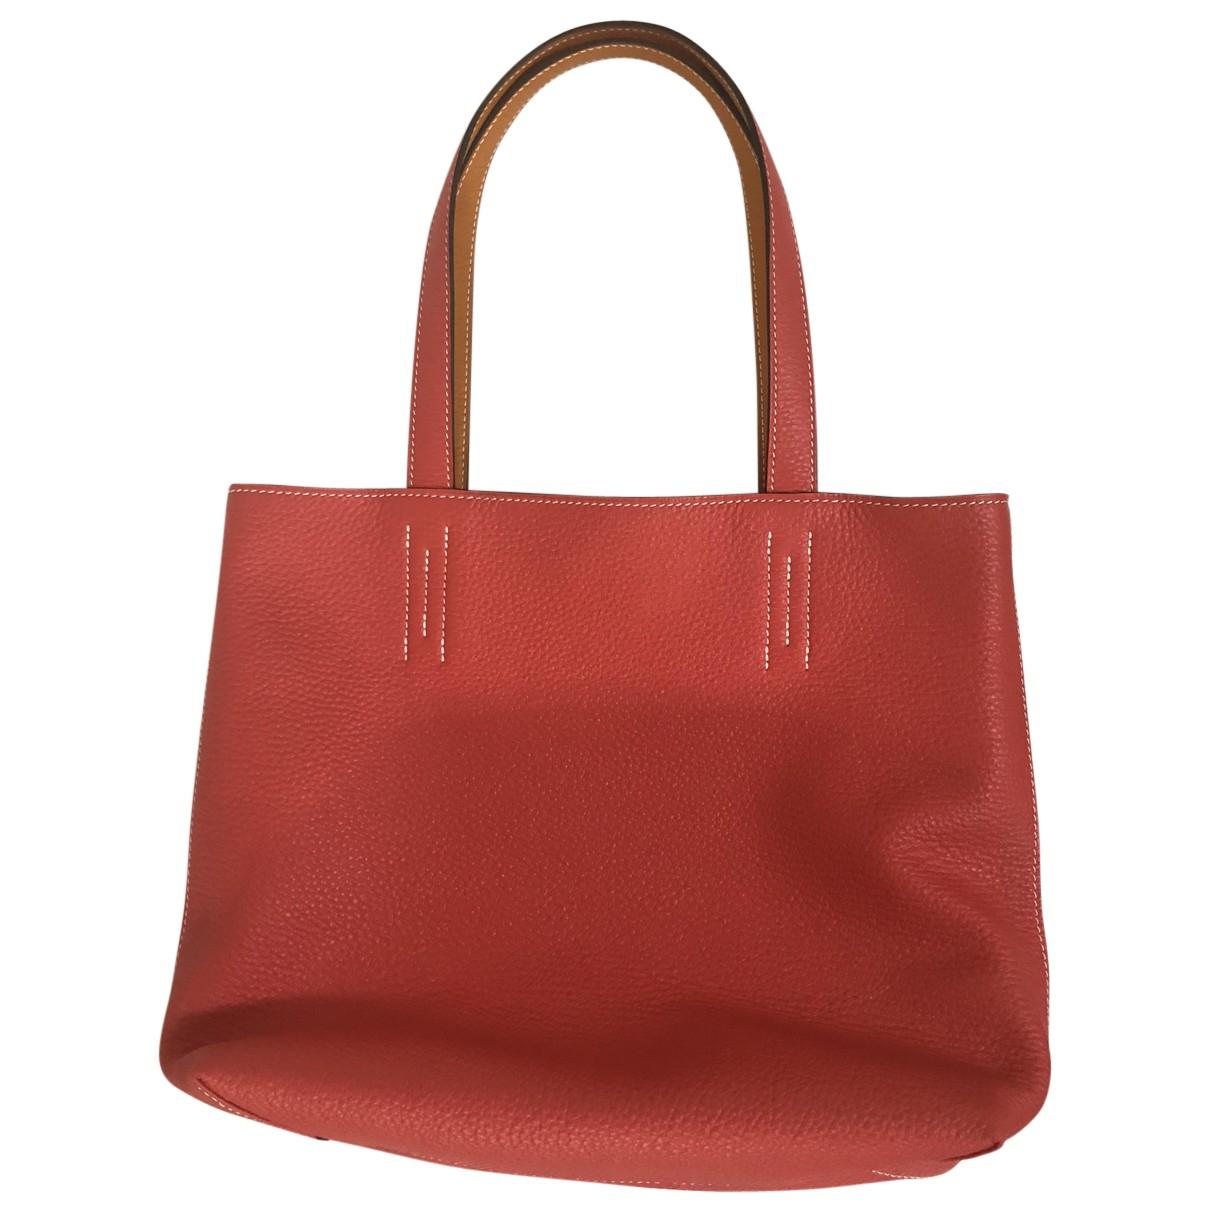 Hermès Double sens Orange Leather handbag for Women N